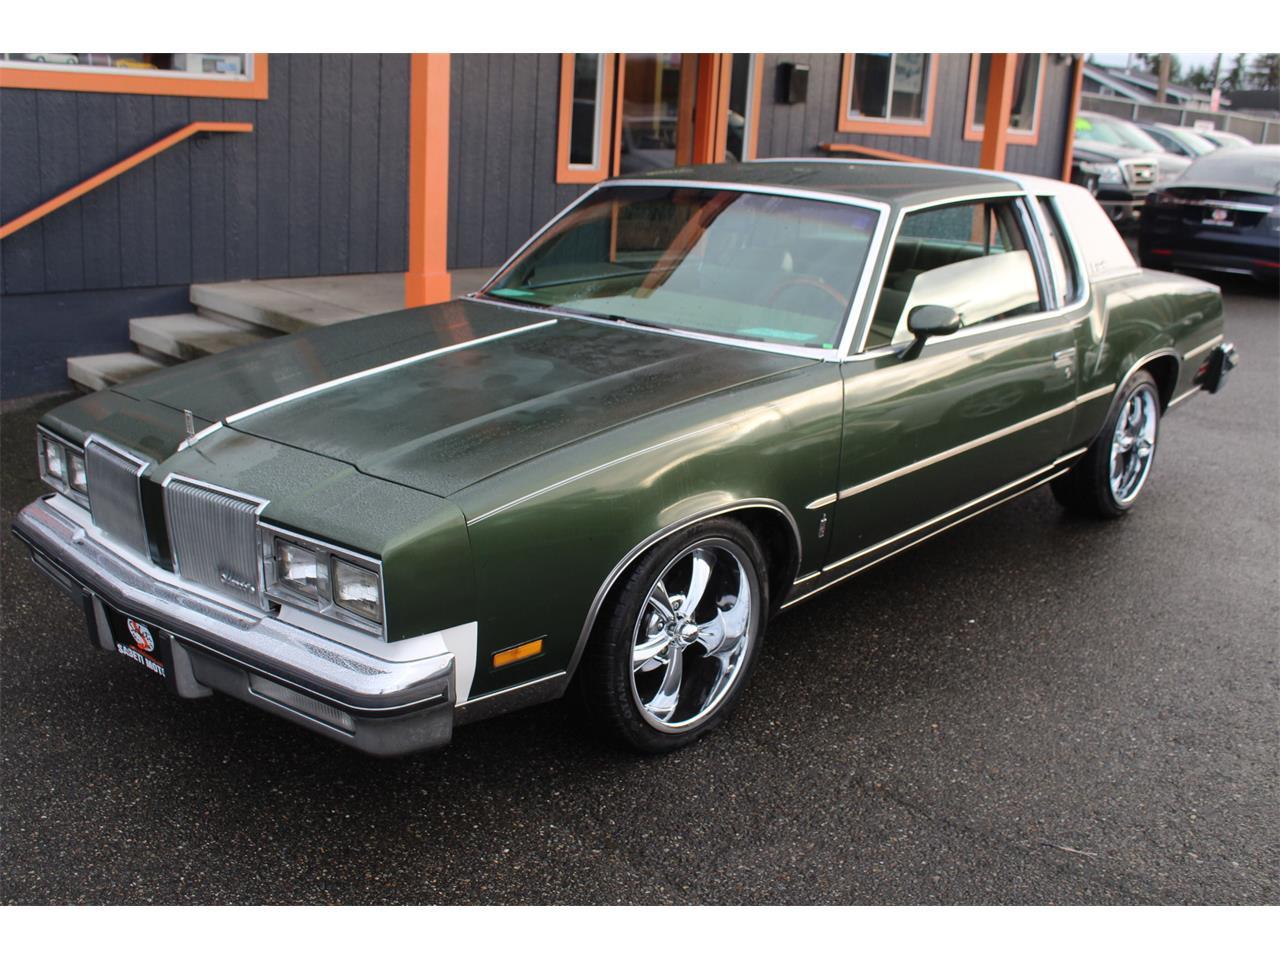 1980 Oldsmobile Cutlass (CC-1434262) for sale in Tacoma, Washington